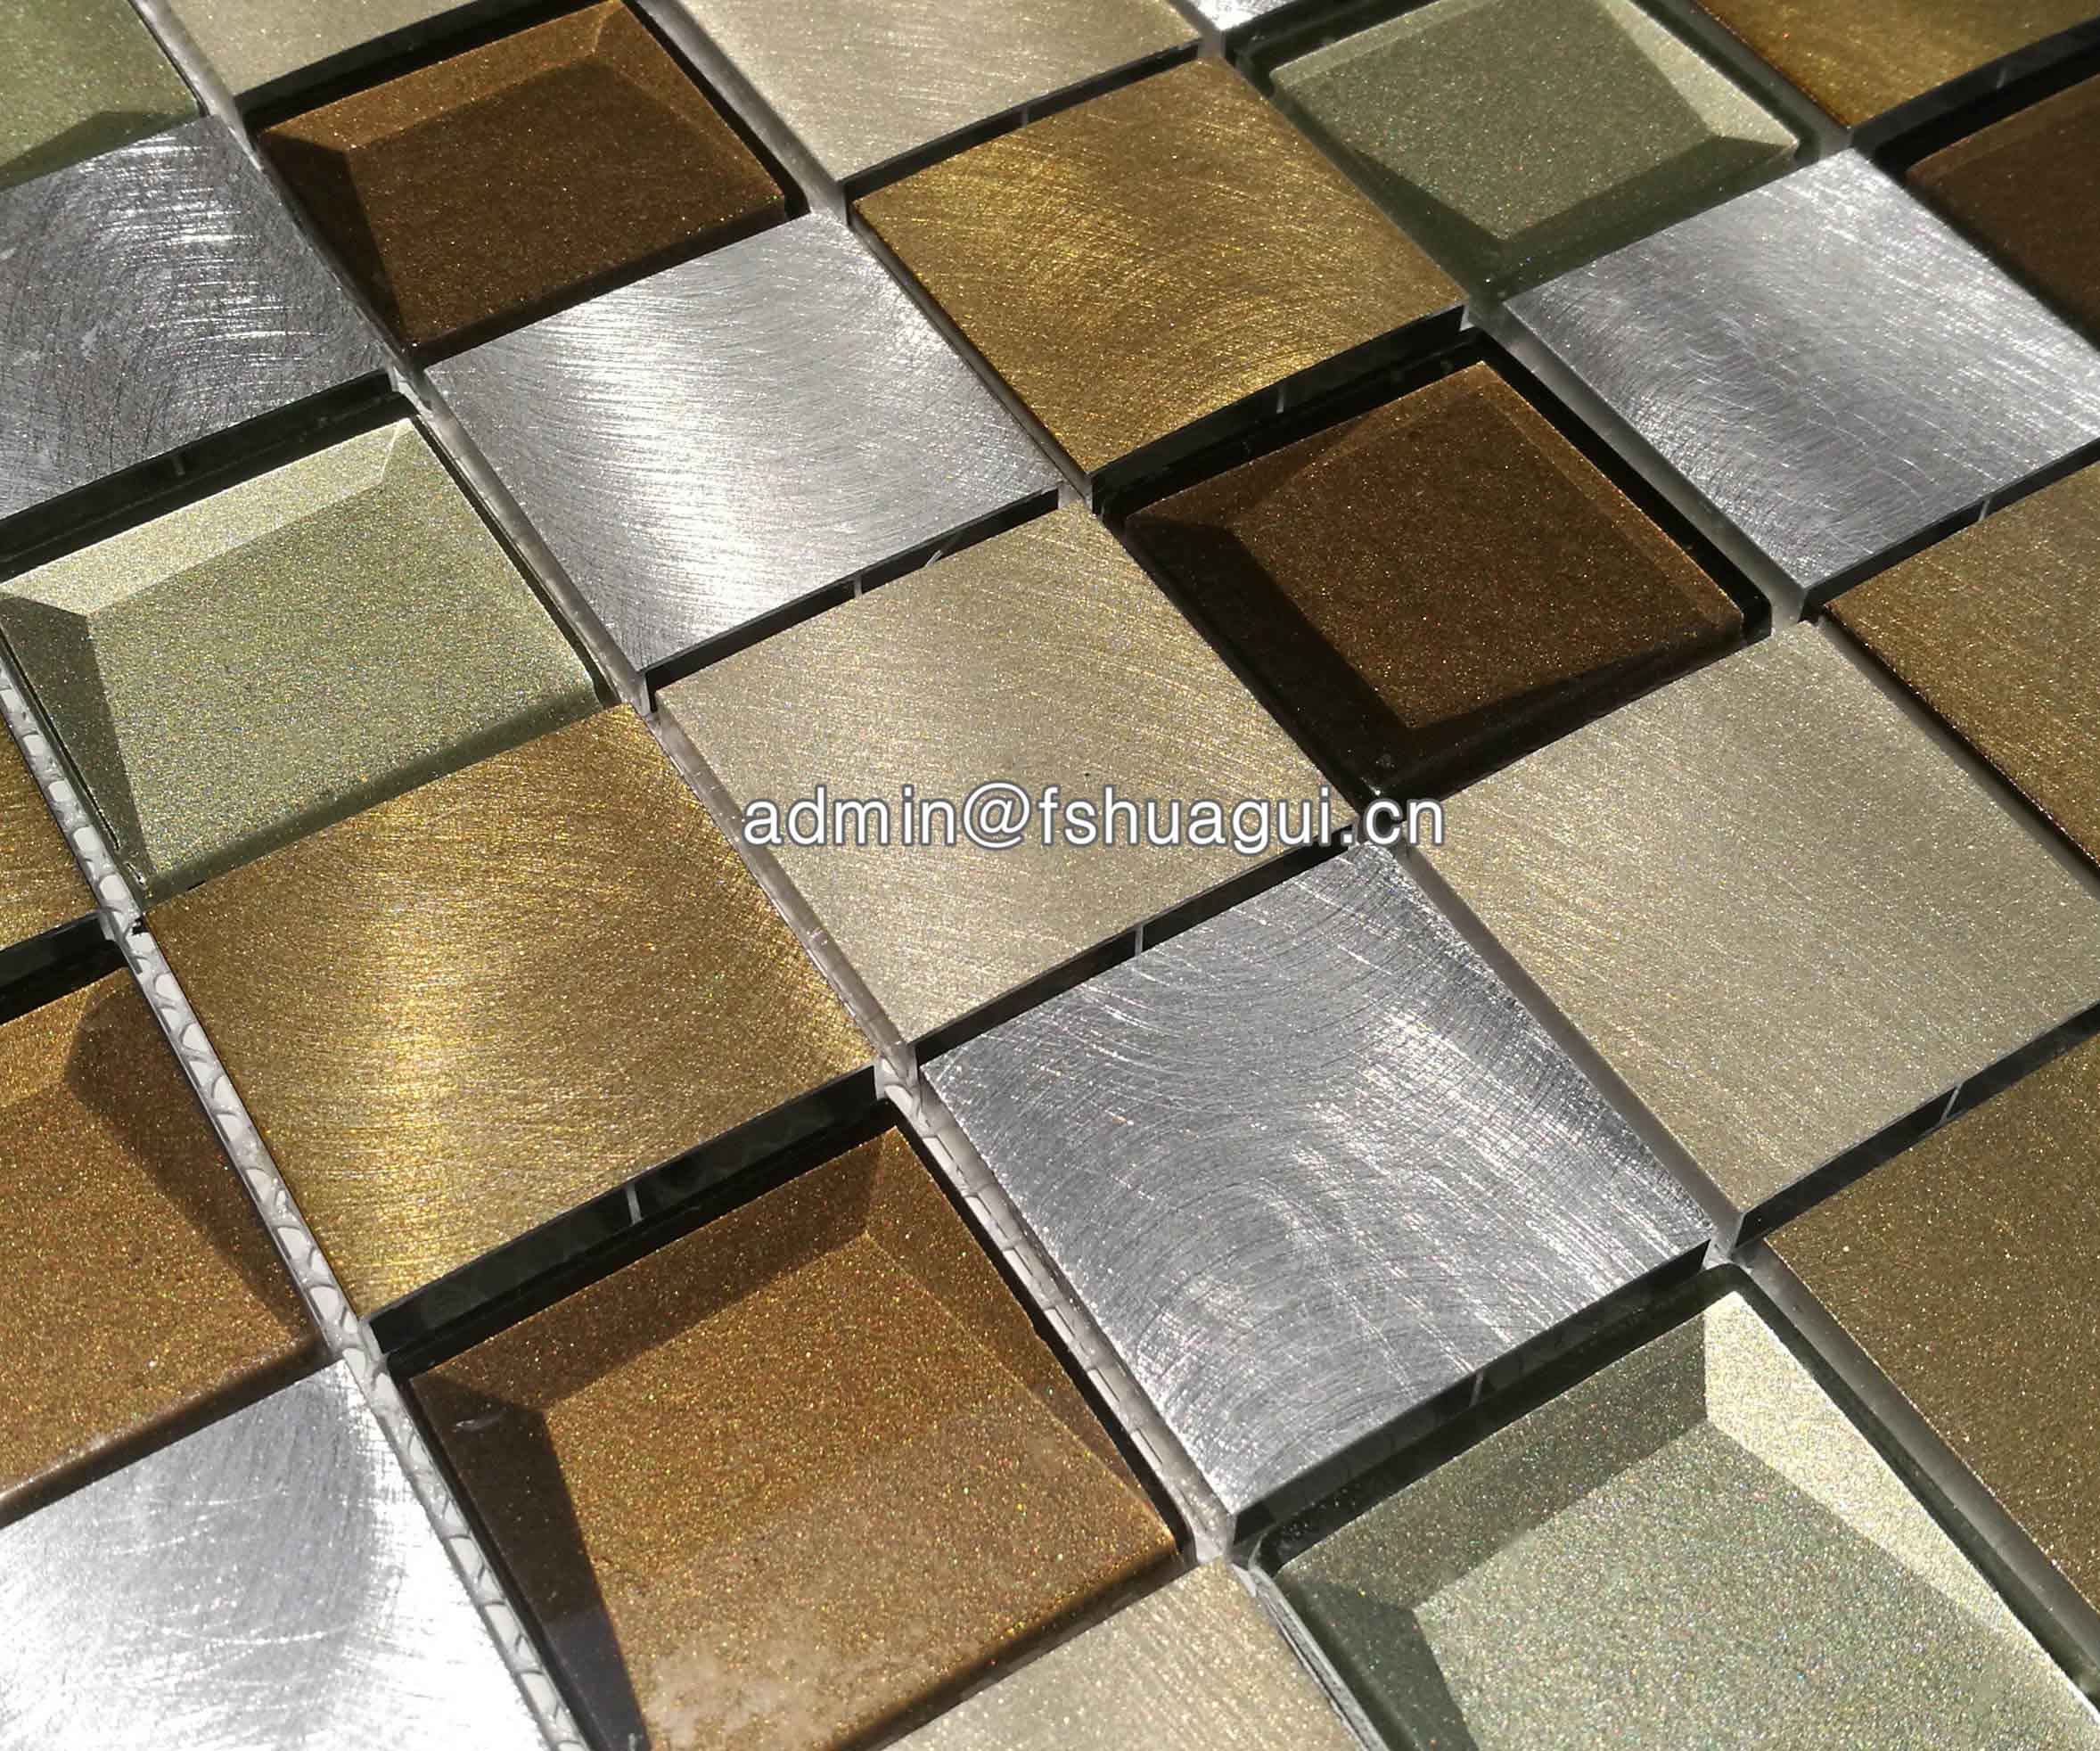 Huagui 3d beveled mosaic blend metal tile backsplash HG-WJ423 METAL MOSAIC TILE image1